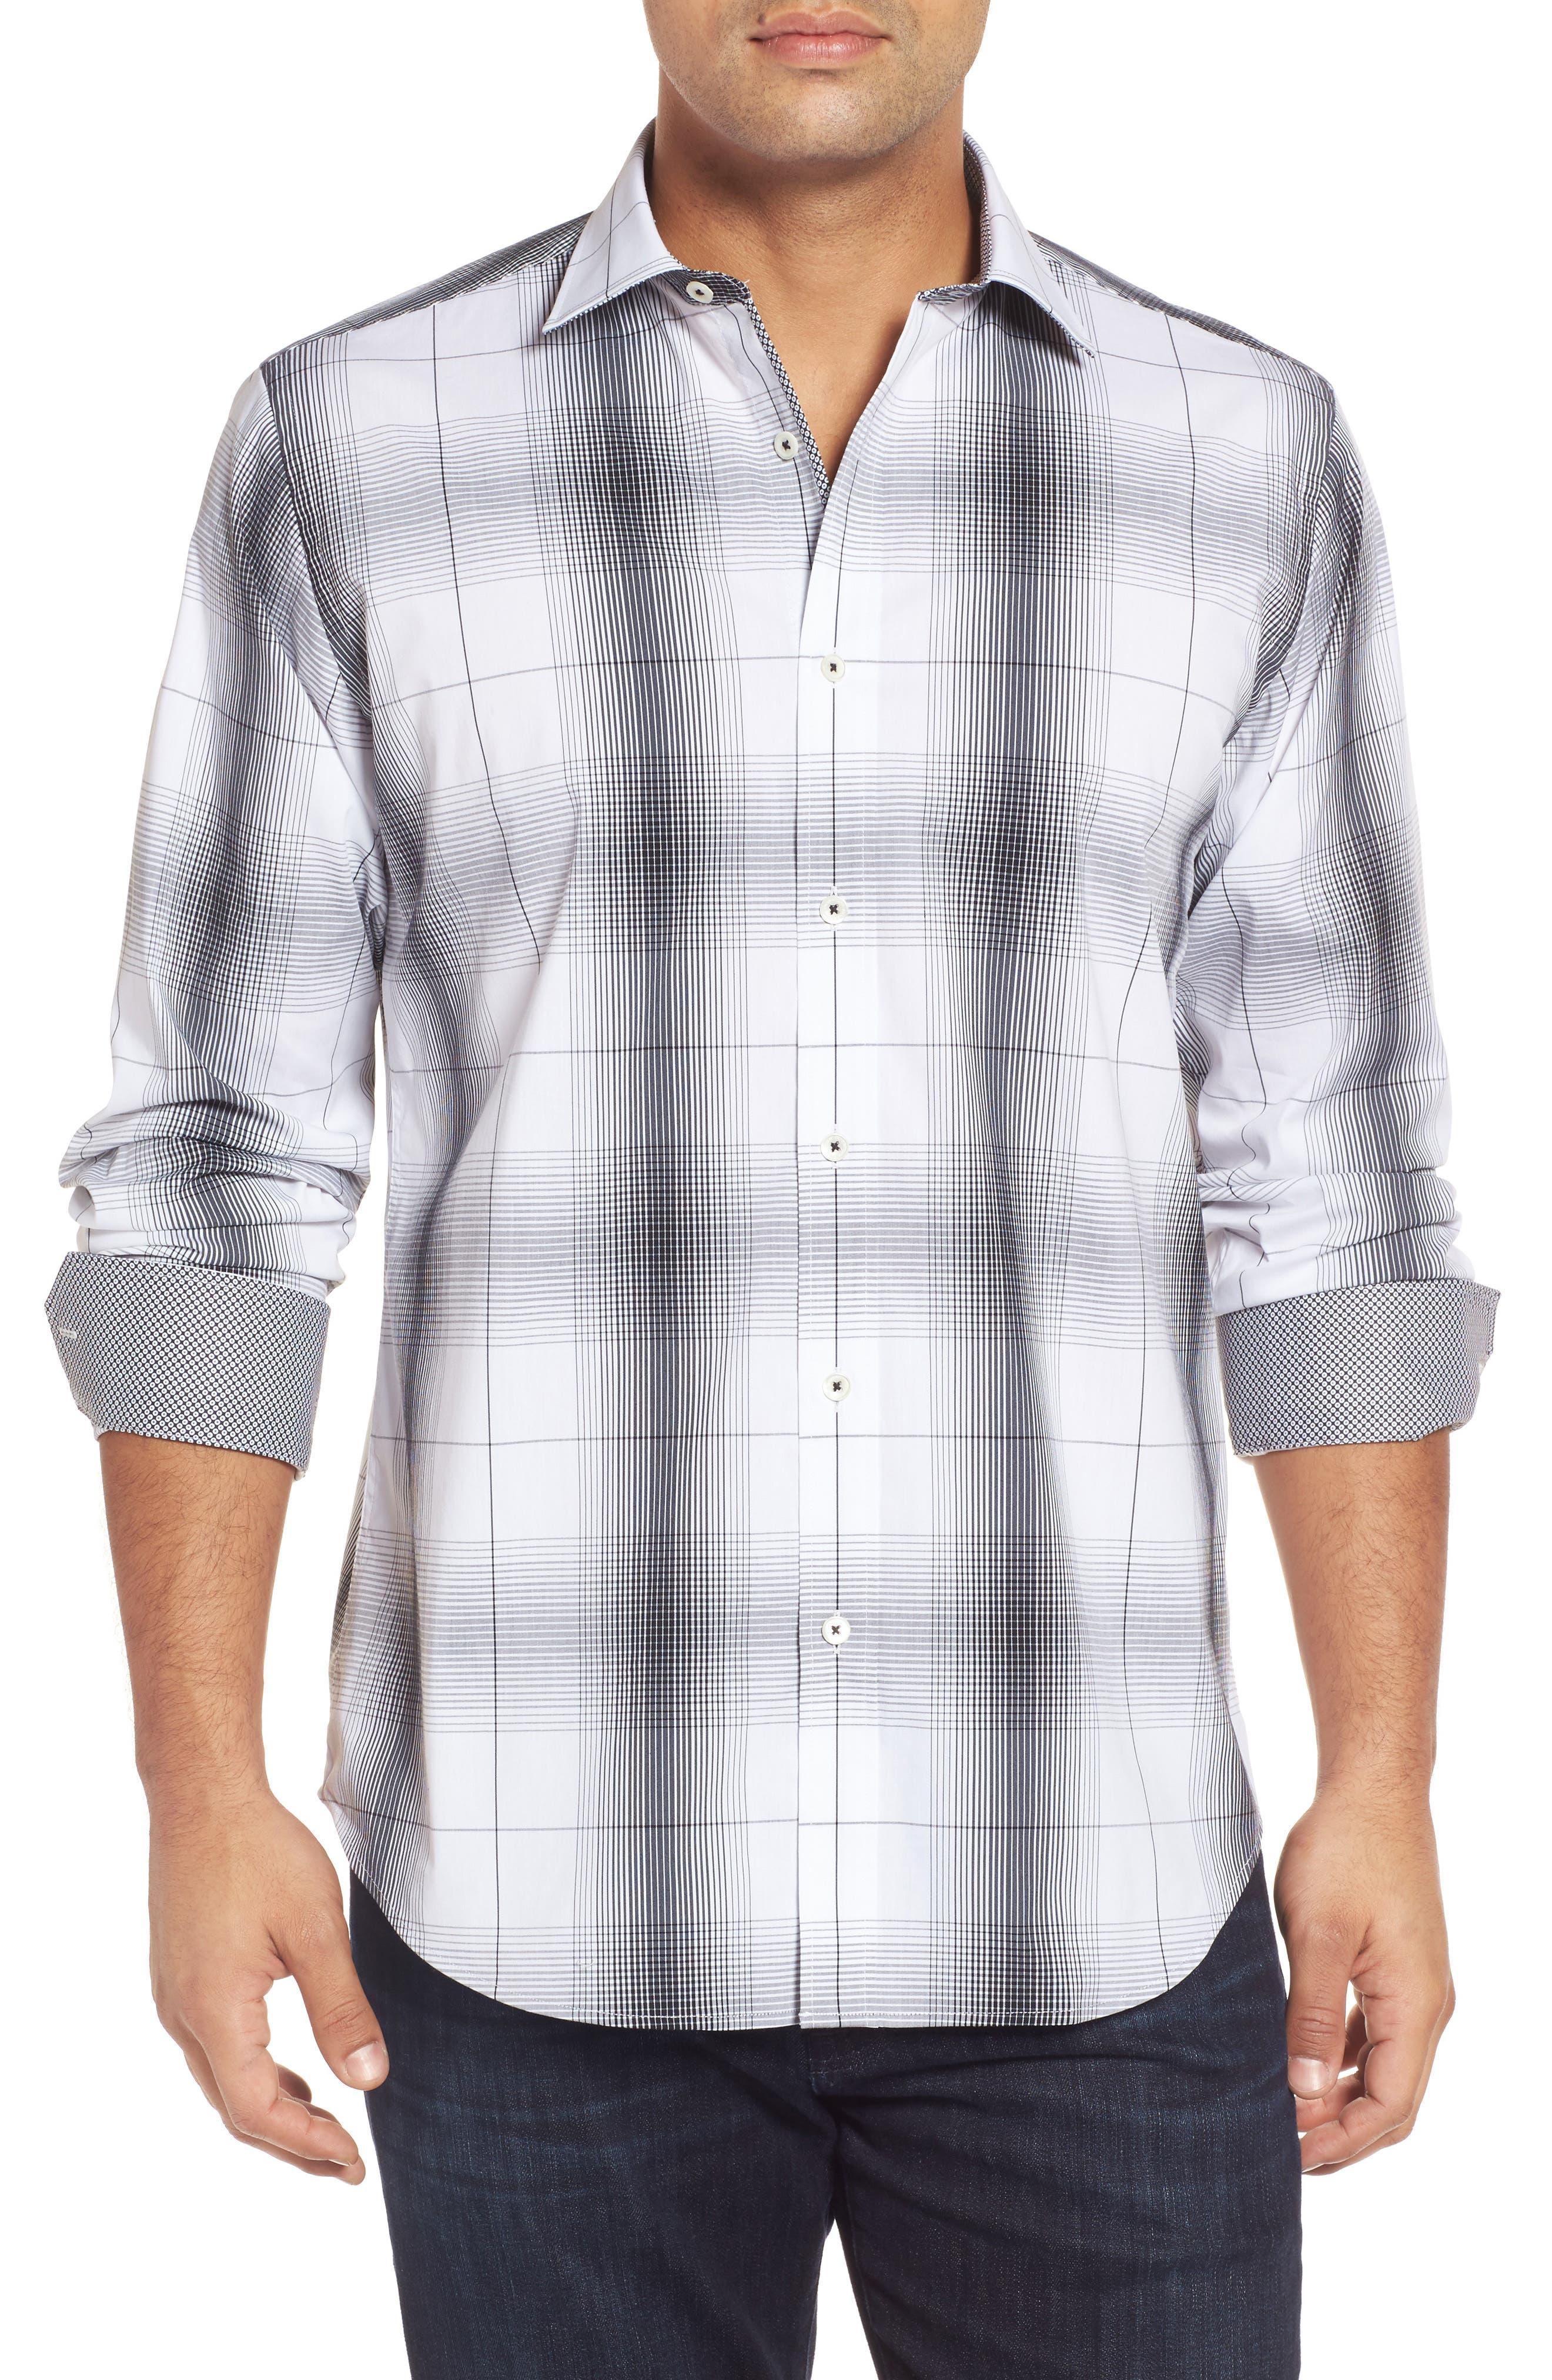 Alternate Image 1 Selected - Bugatchi Classic Fit Ombré Plaid Sport Shirt